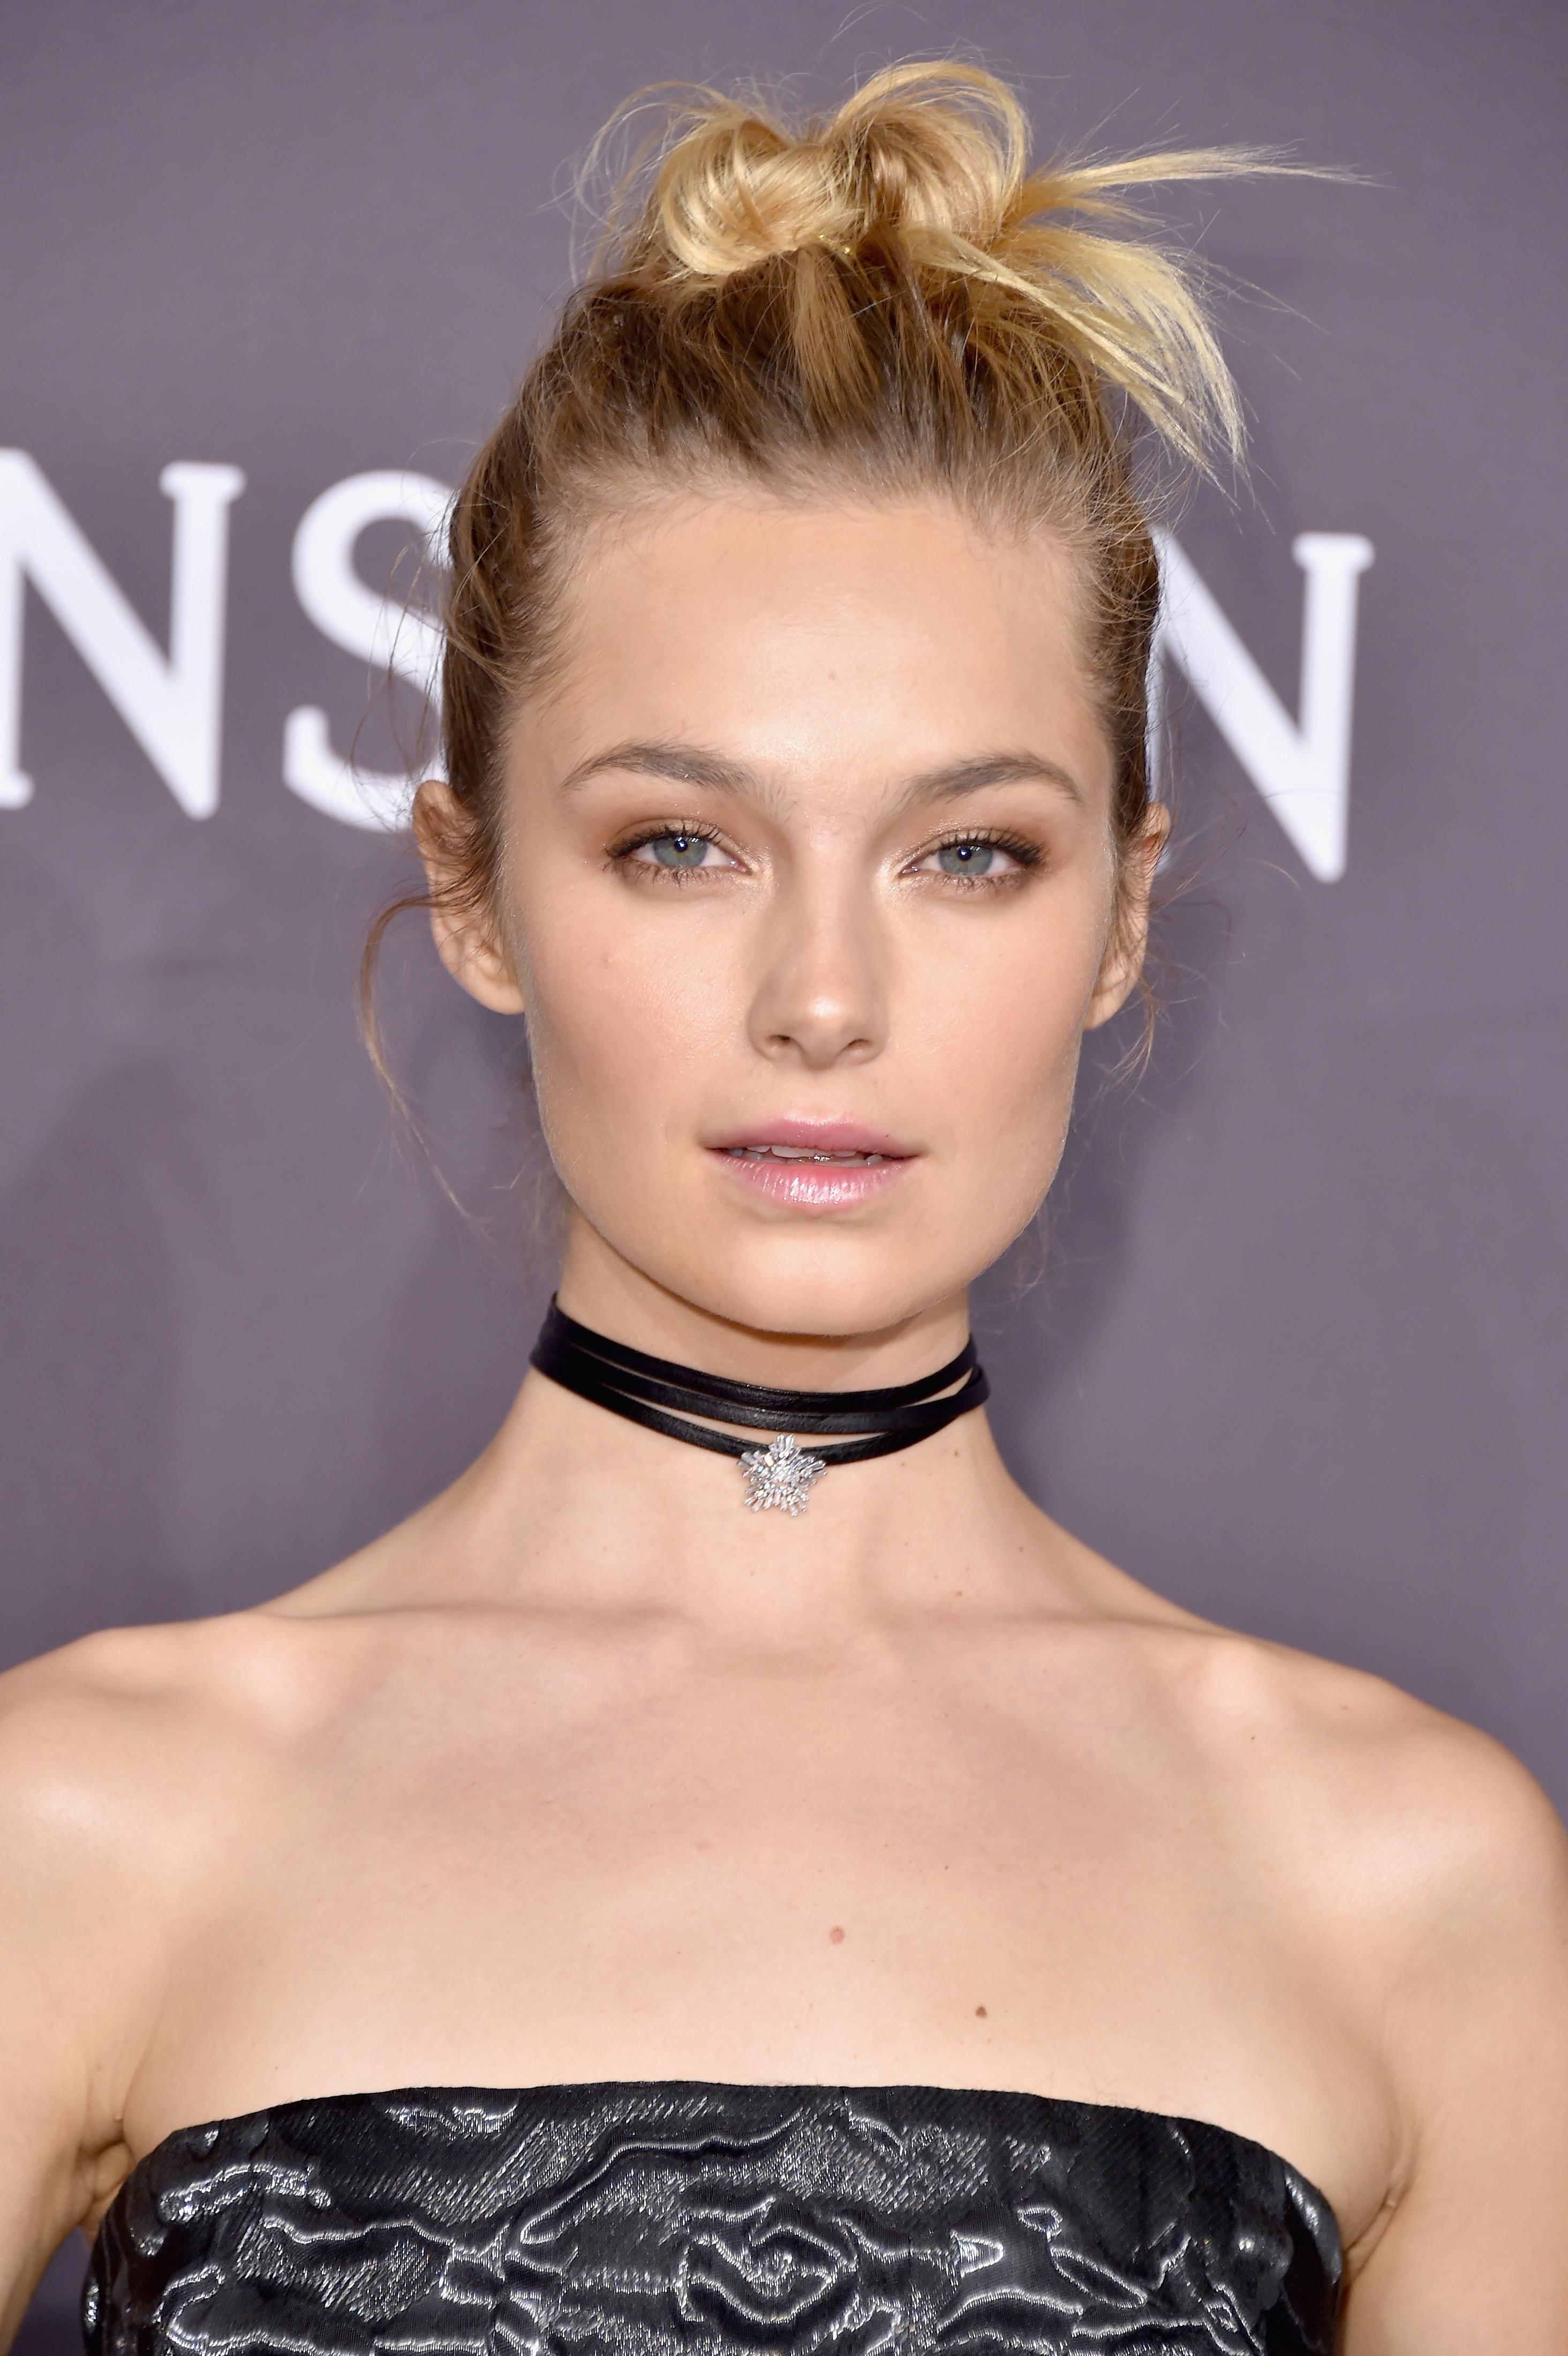 Modelo da Victoria's Secret admite ter sido coagida a posar nua